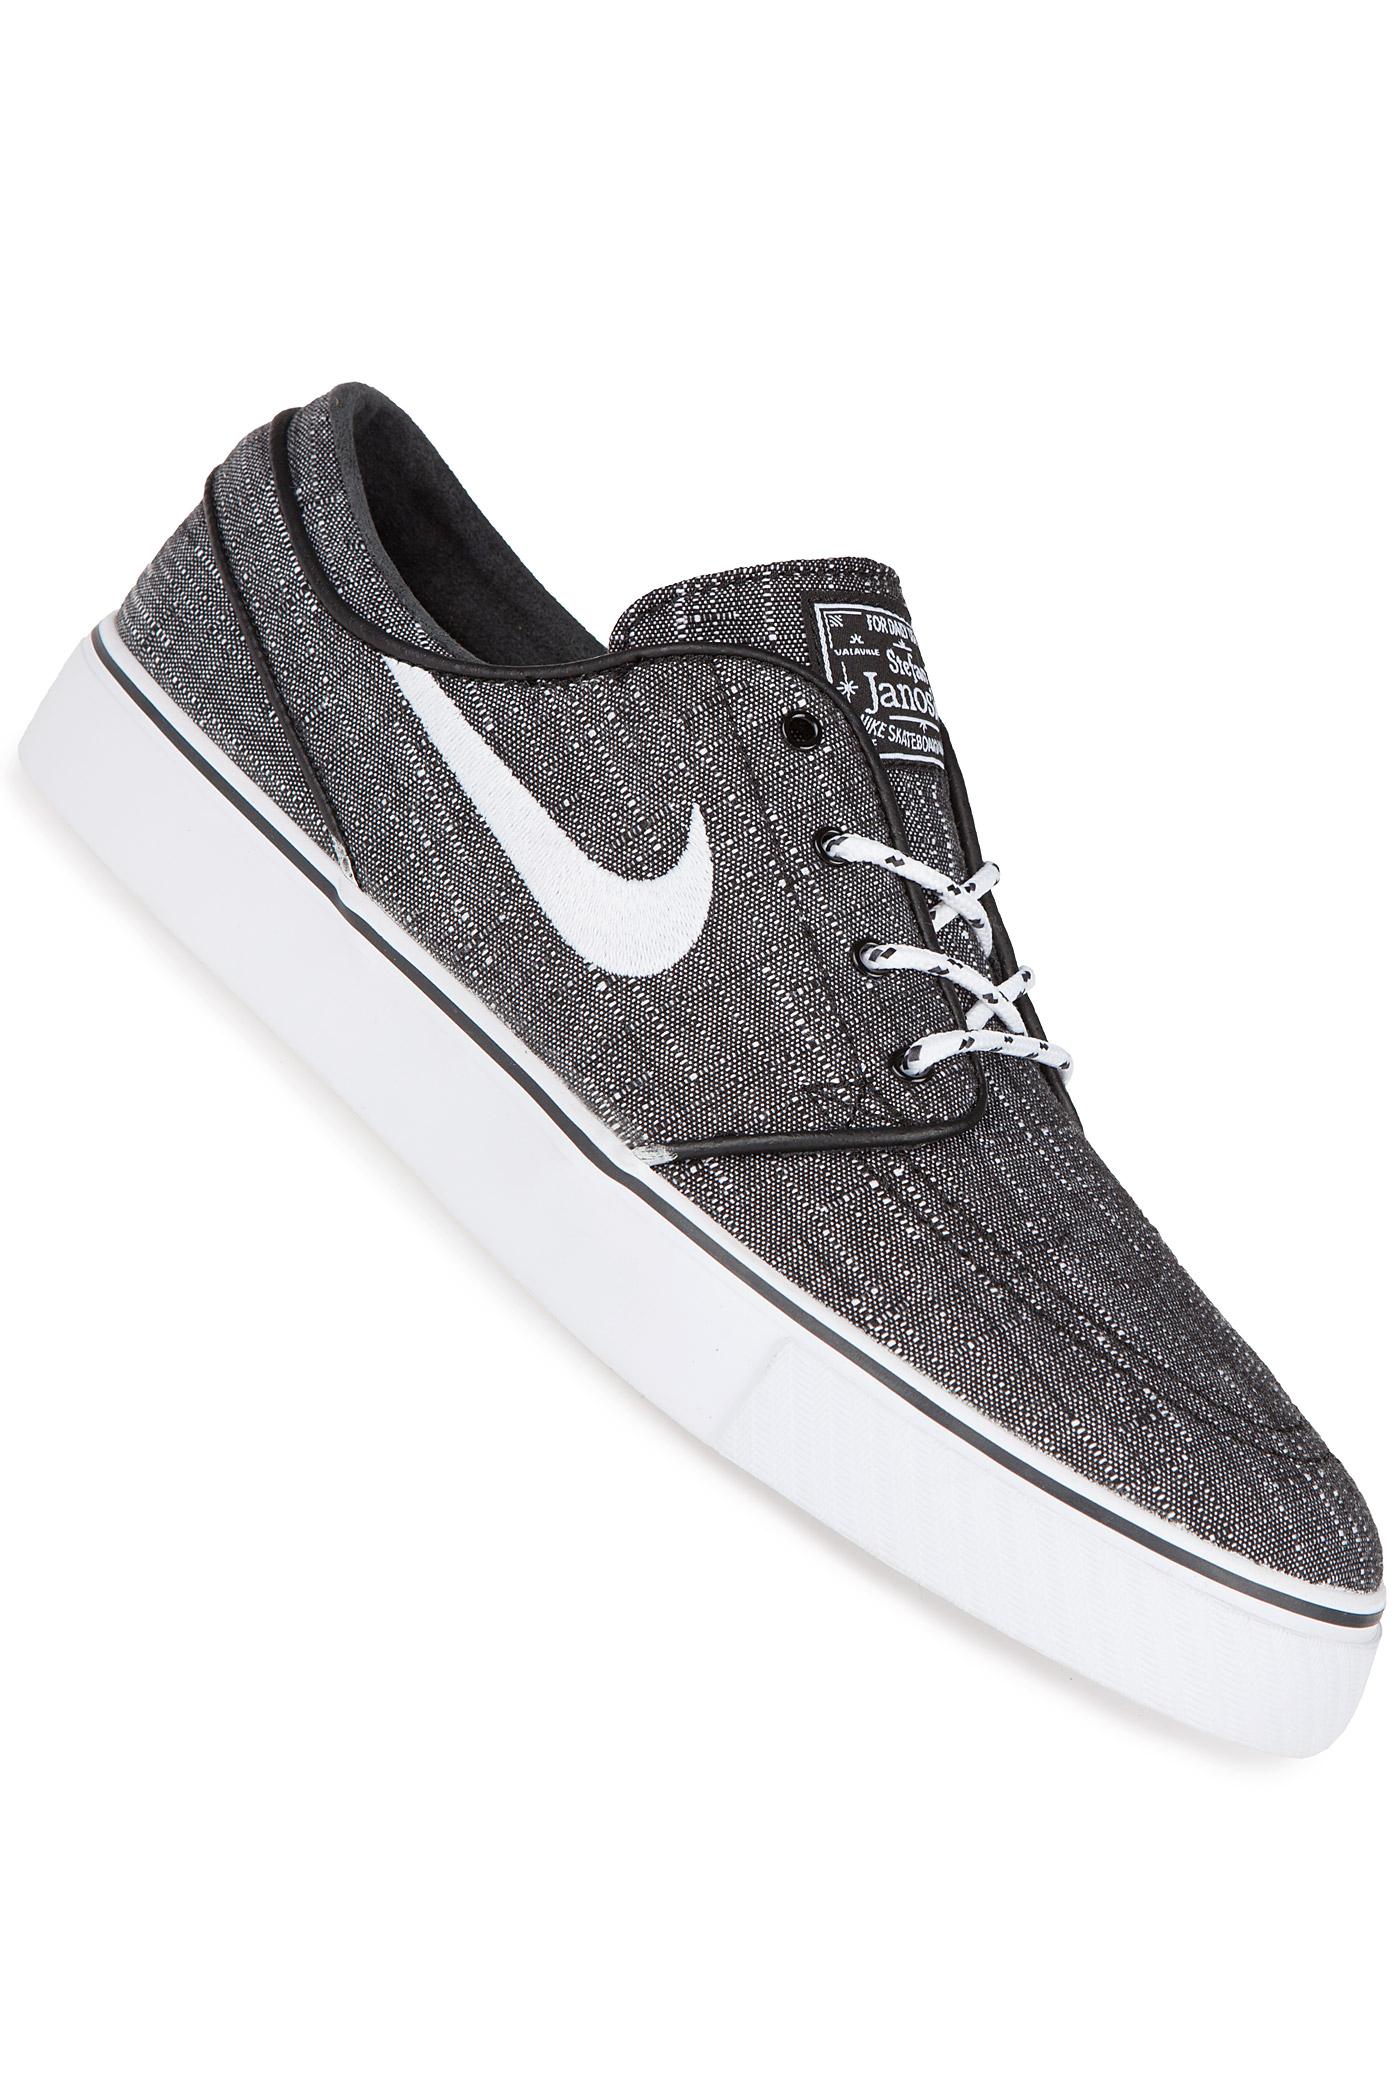 Nike Sb Zoom Stefan Janoski Canvas Schuh